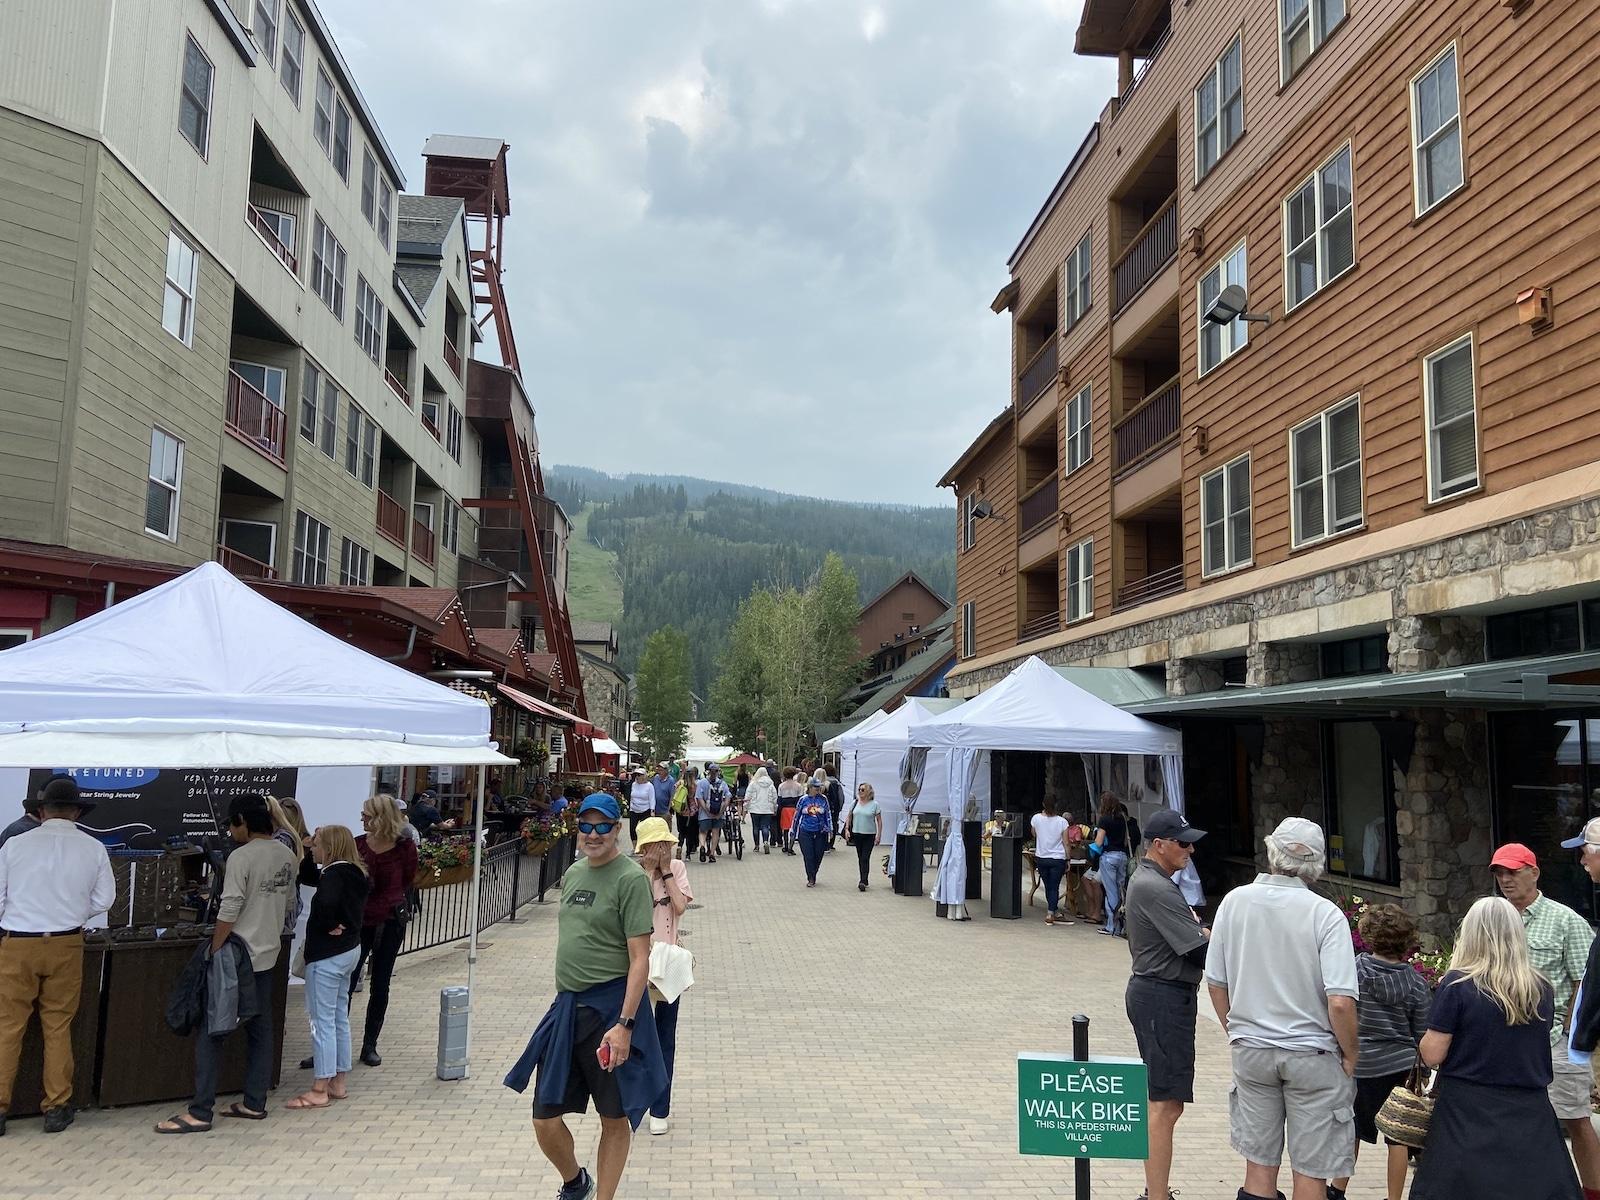 Keystone Colorado Summer Art Festival